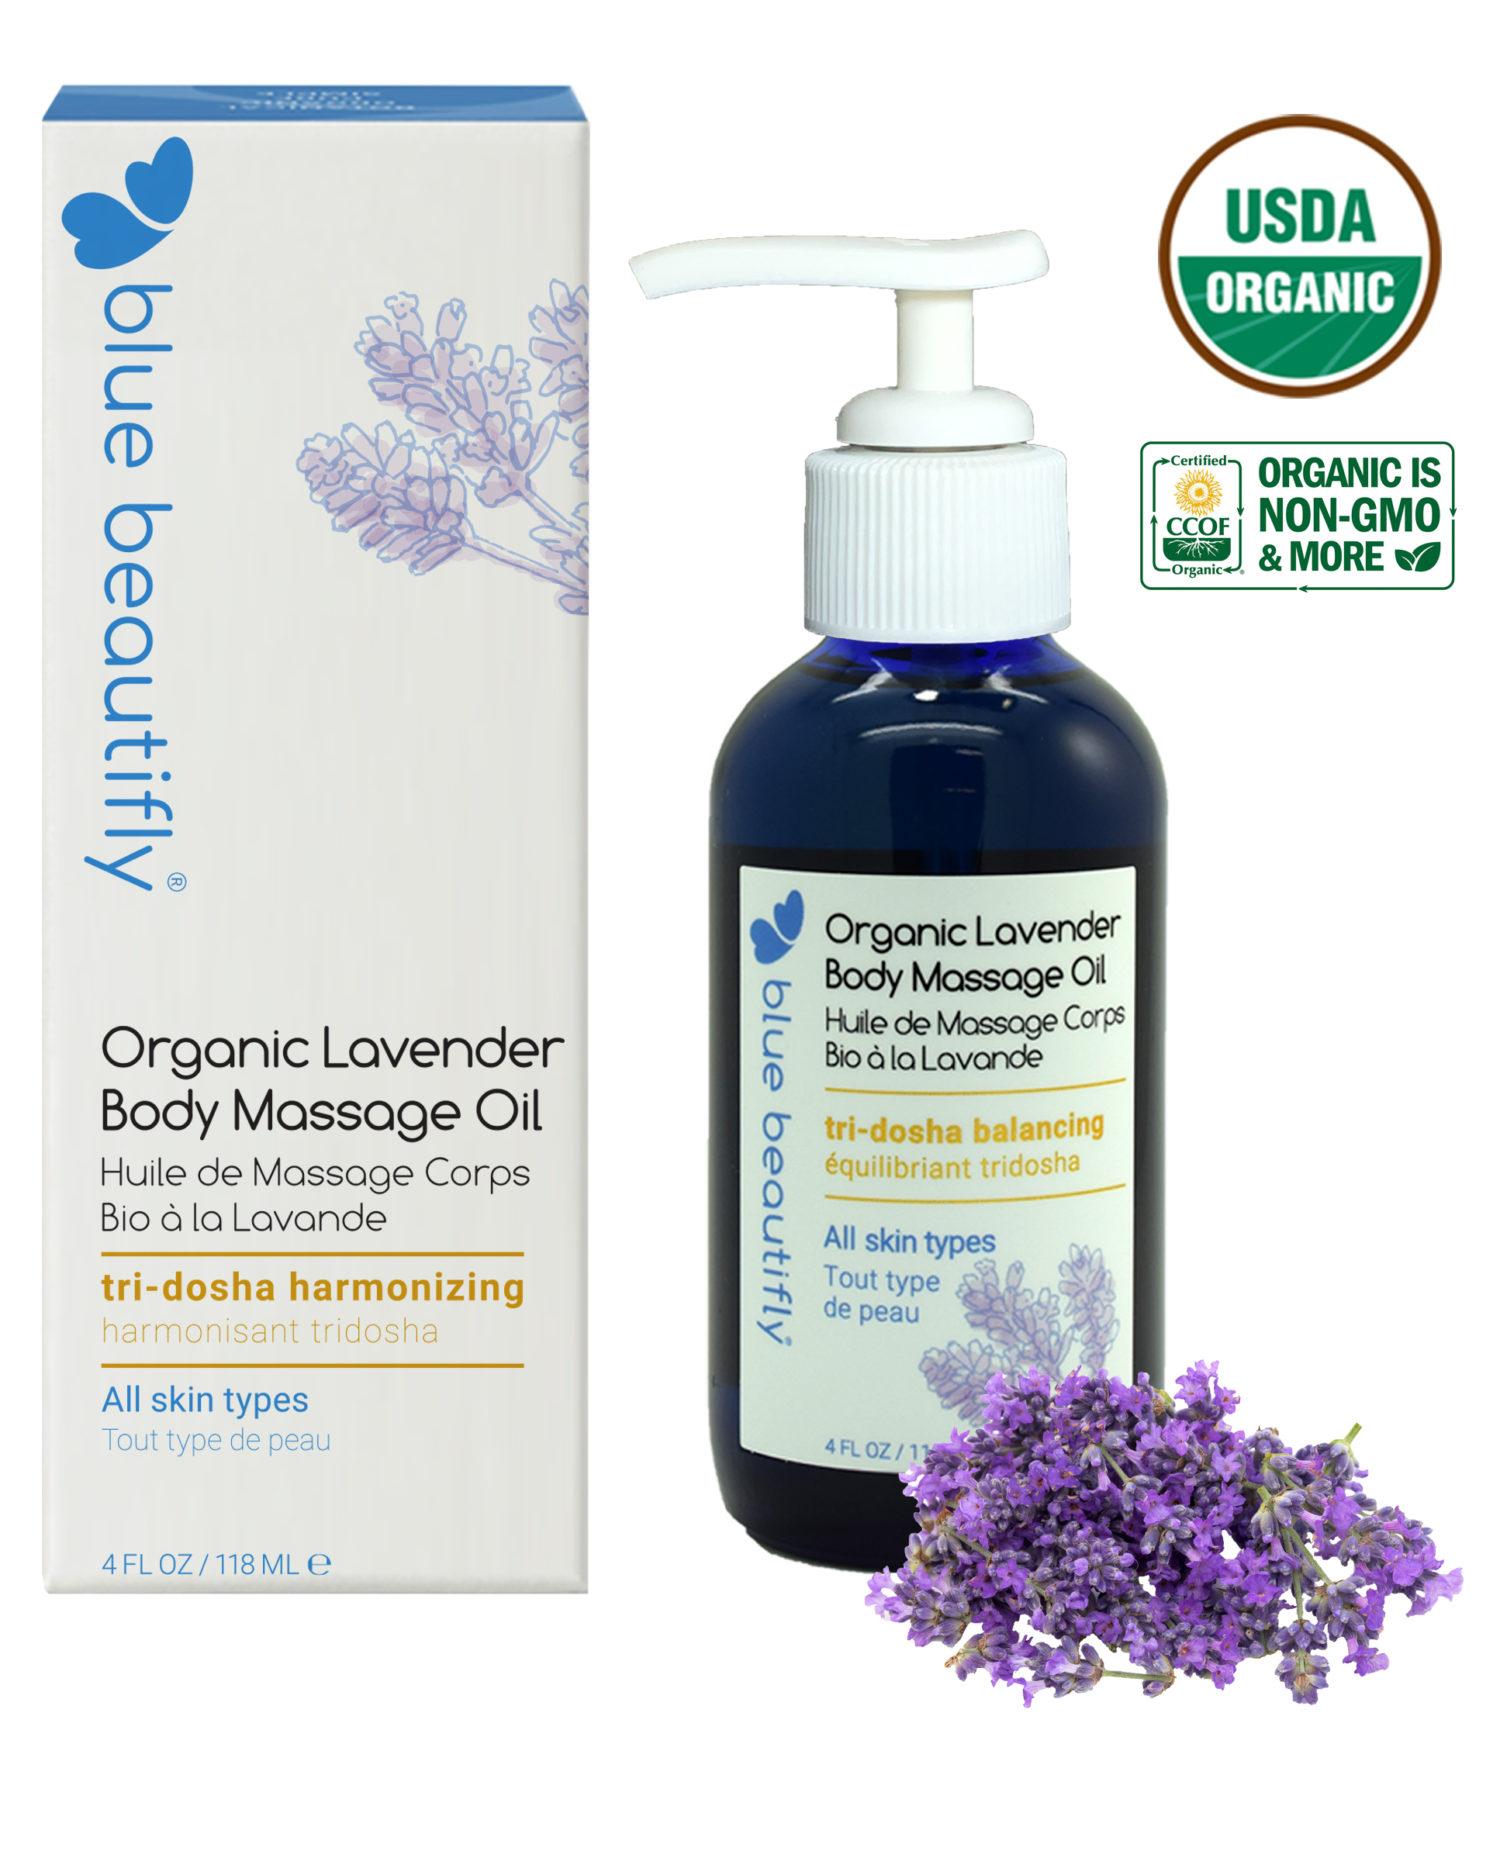 Organic Lavender Body Massage Oil